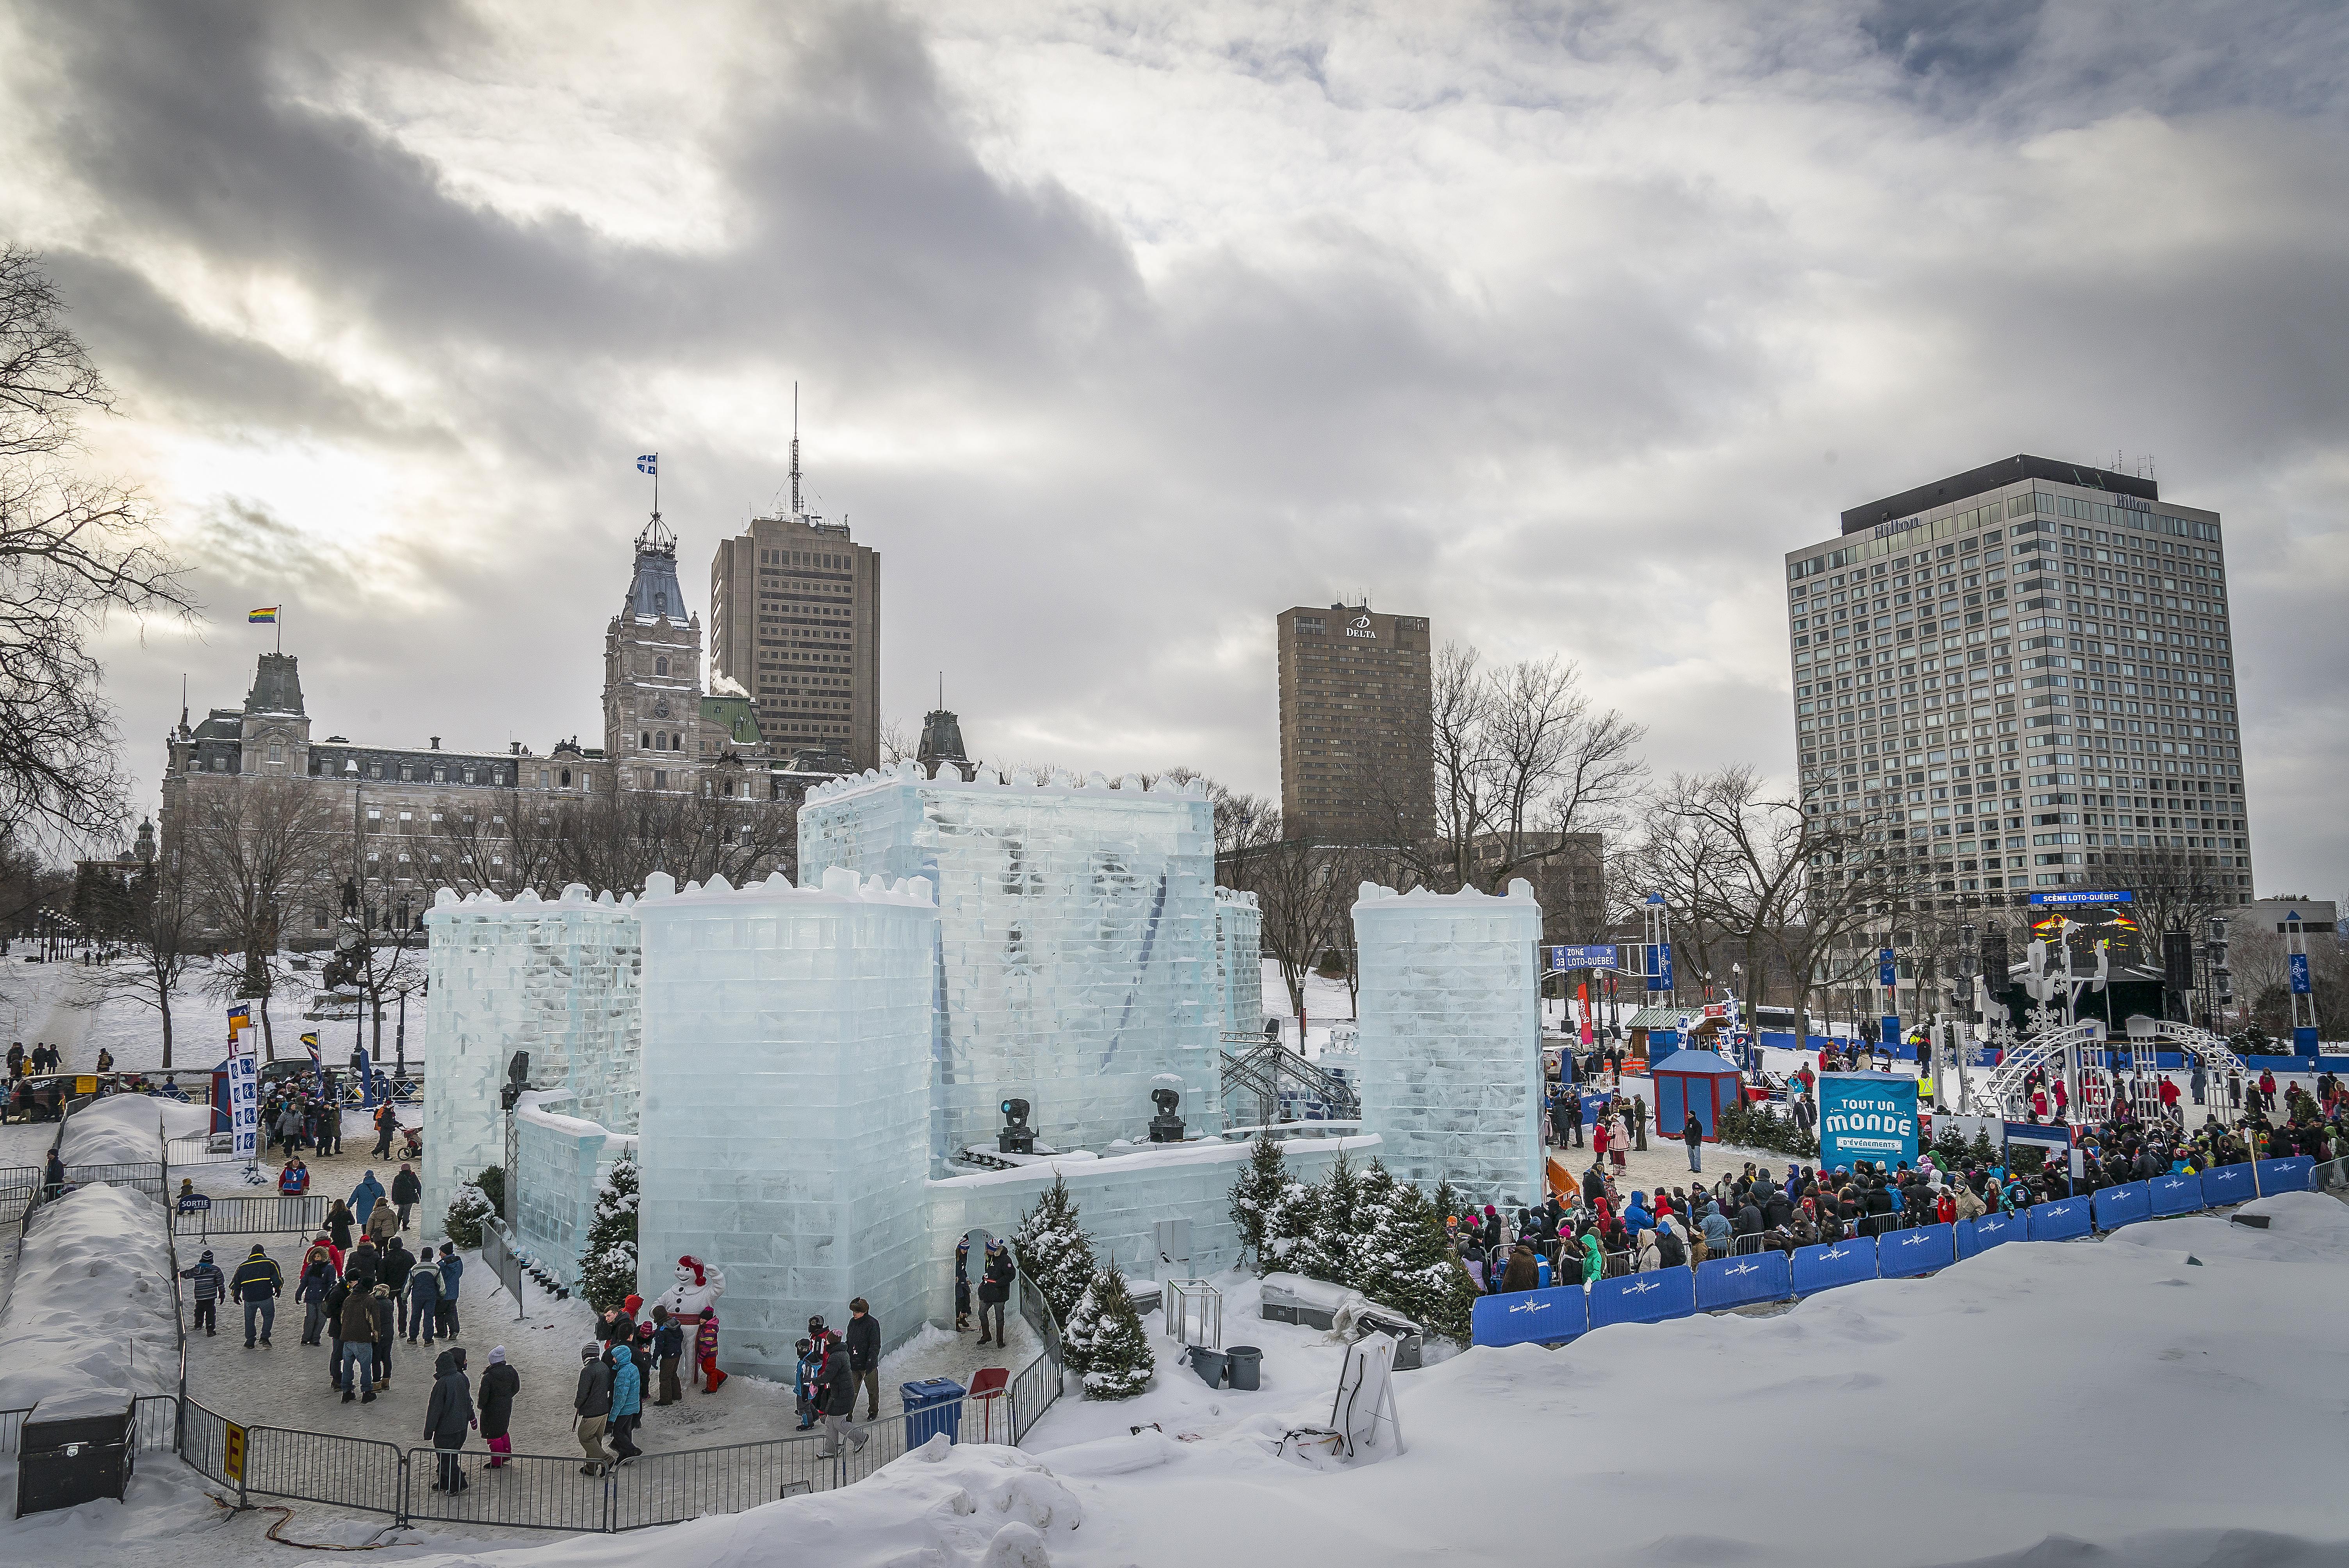 File:Le 60e Carnaval de Québec (12665360985).jpg - Wikimedia Commons